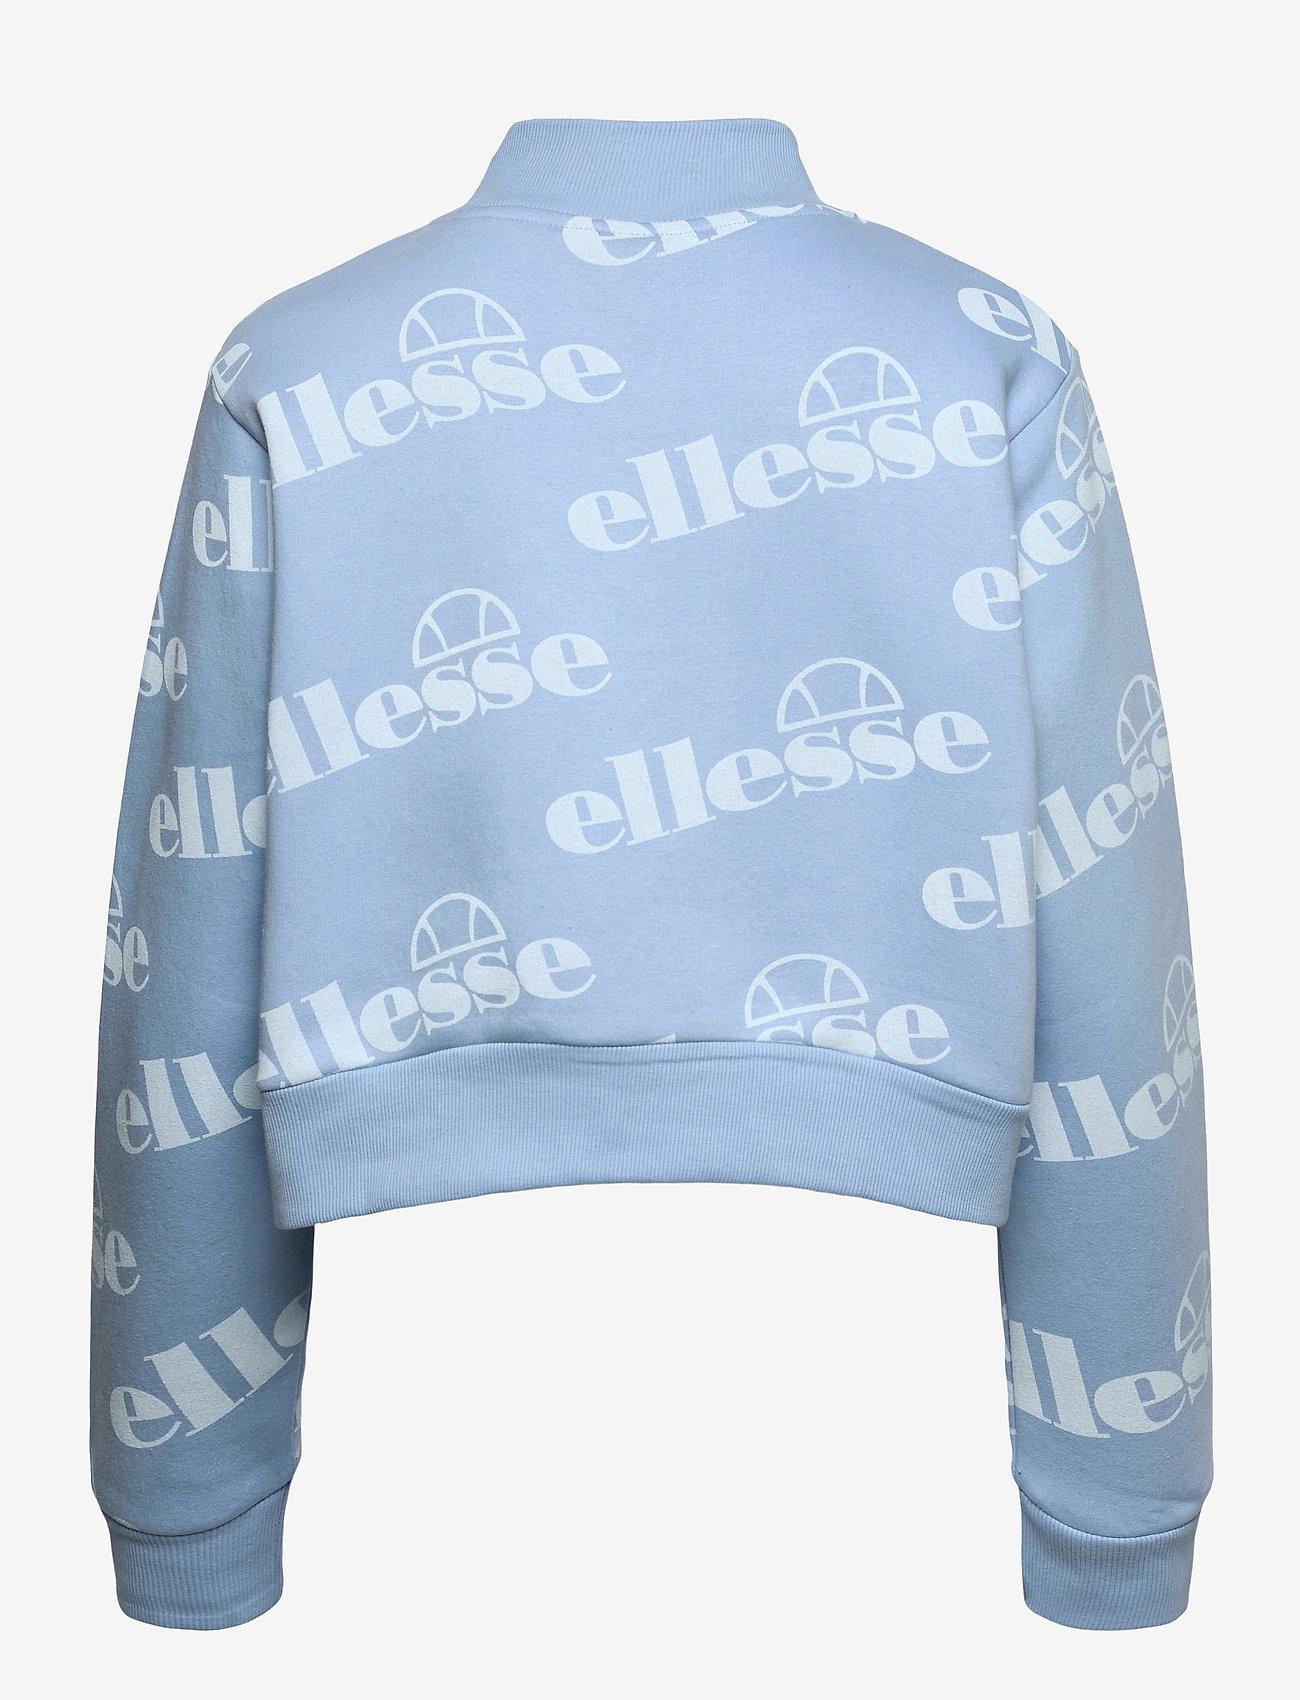 Ellesse - EL FULMIRE SWEATSHIRT - sweatshirts - light blue - 1